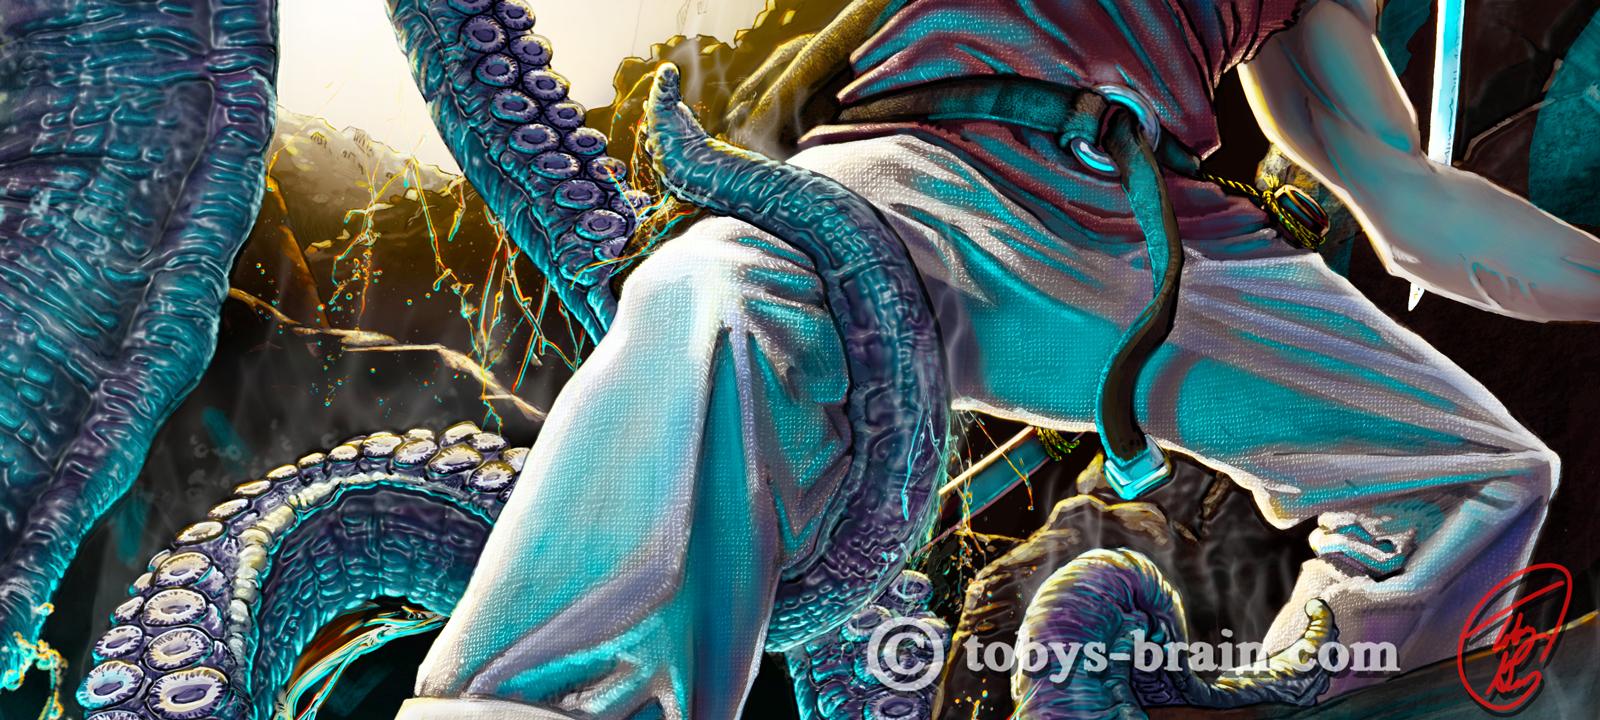 Toby Gray Ohrim-vs-the-cave-squid-zoom3-FW